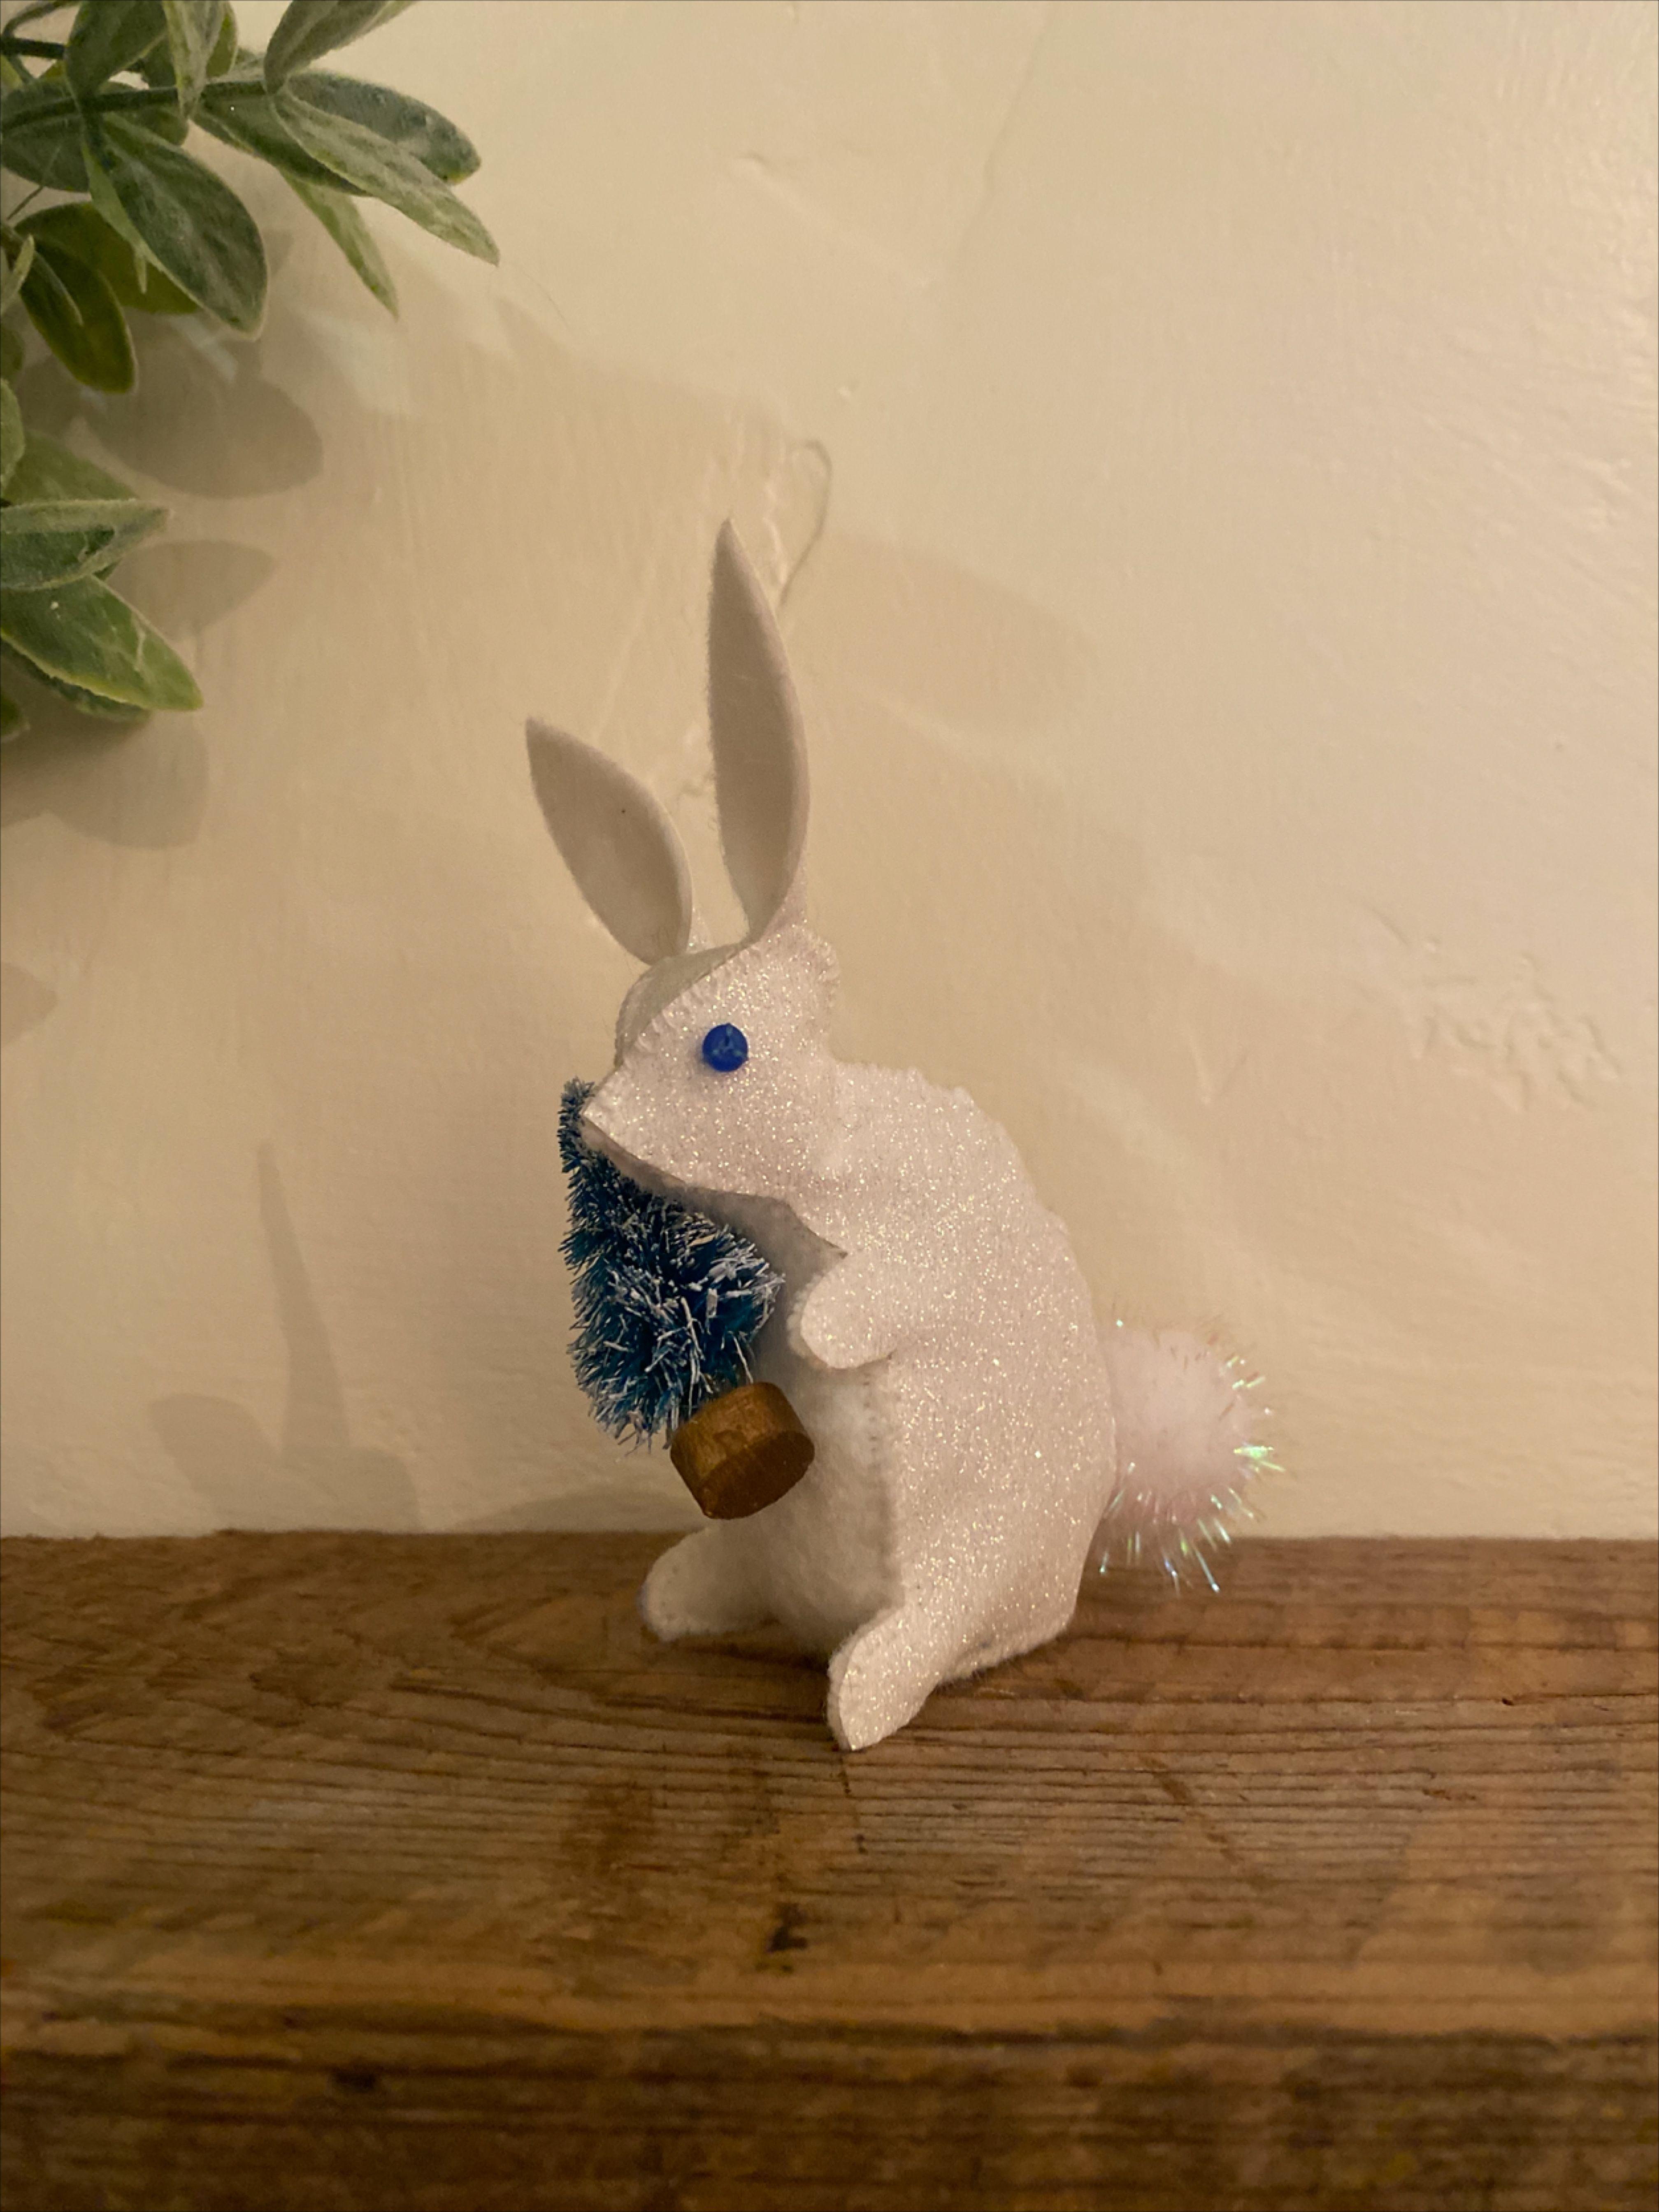 Snow Bunny in 2020 Crafts, Soft sculpture, Ornament decor